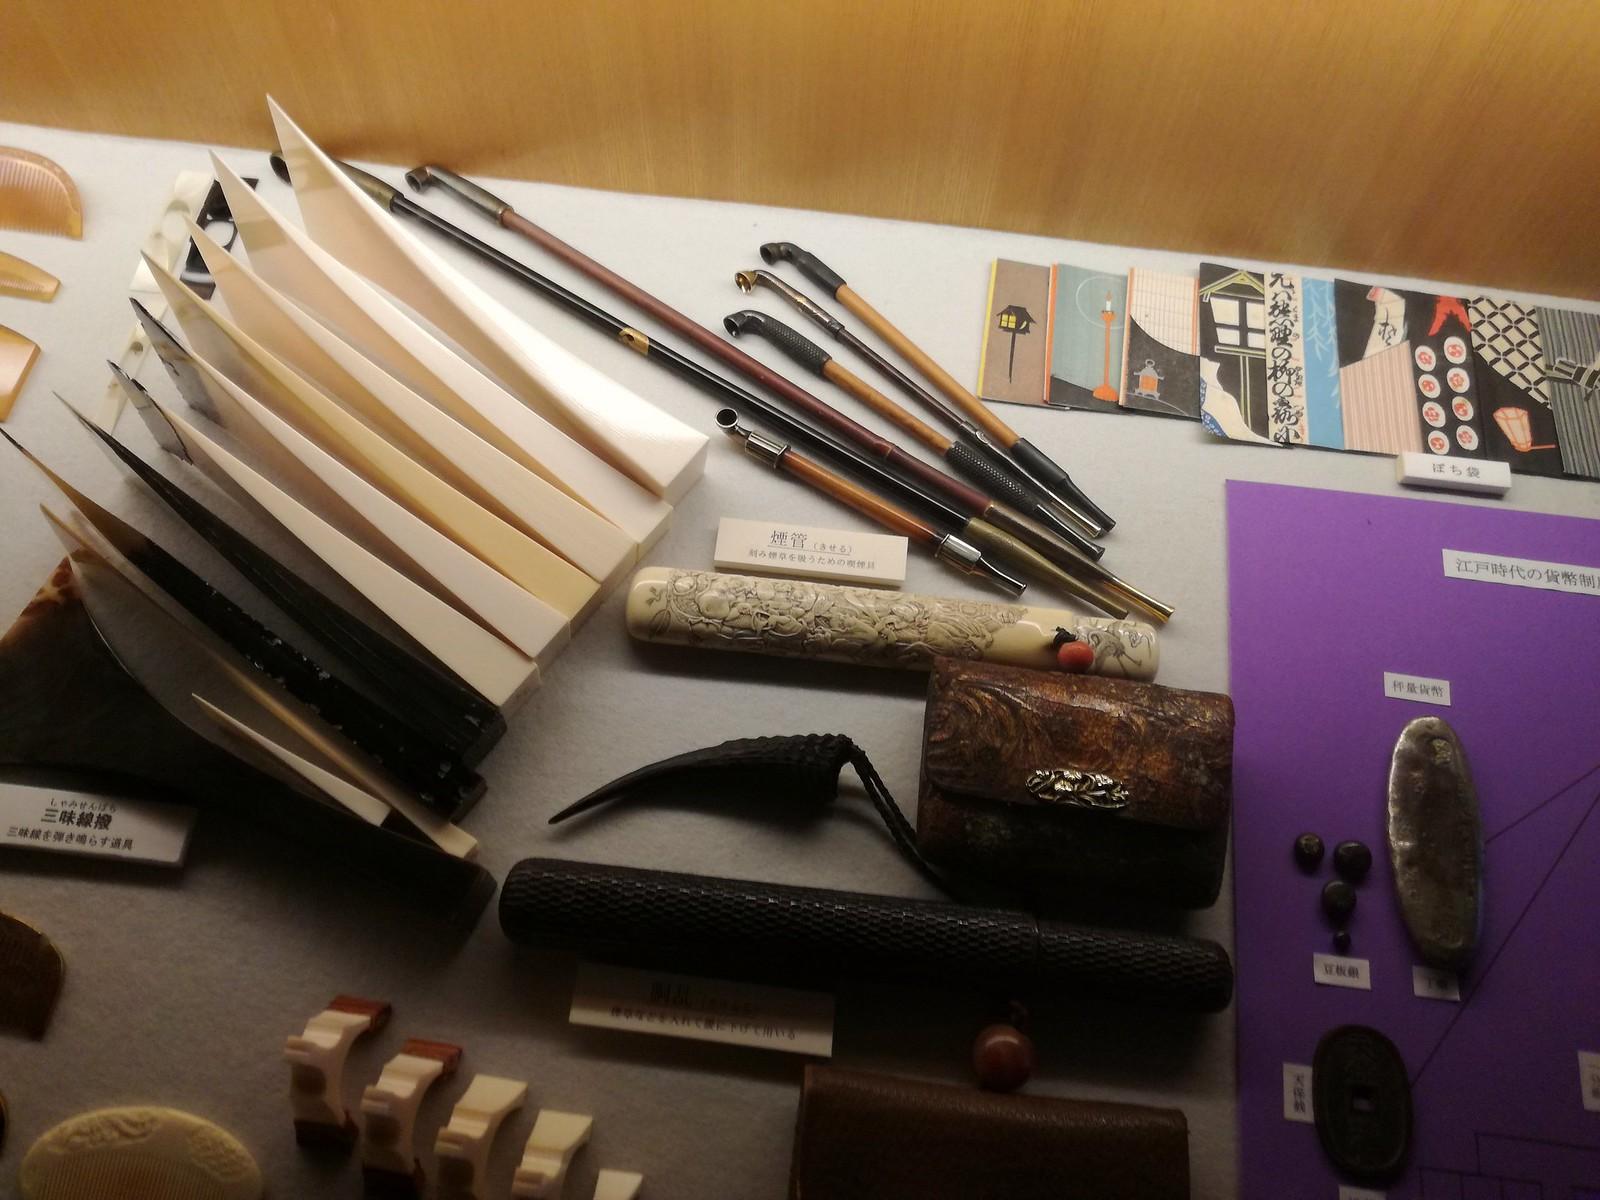 Kanazawa - Shima, maison de geishas - entre autres, des pipes